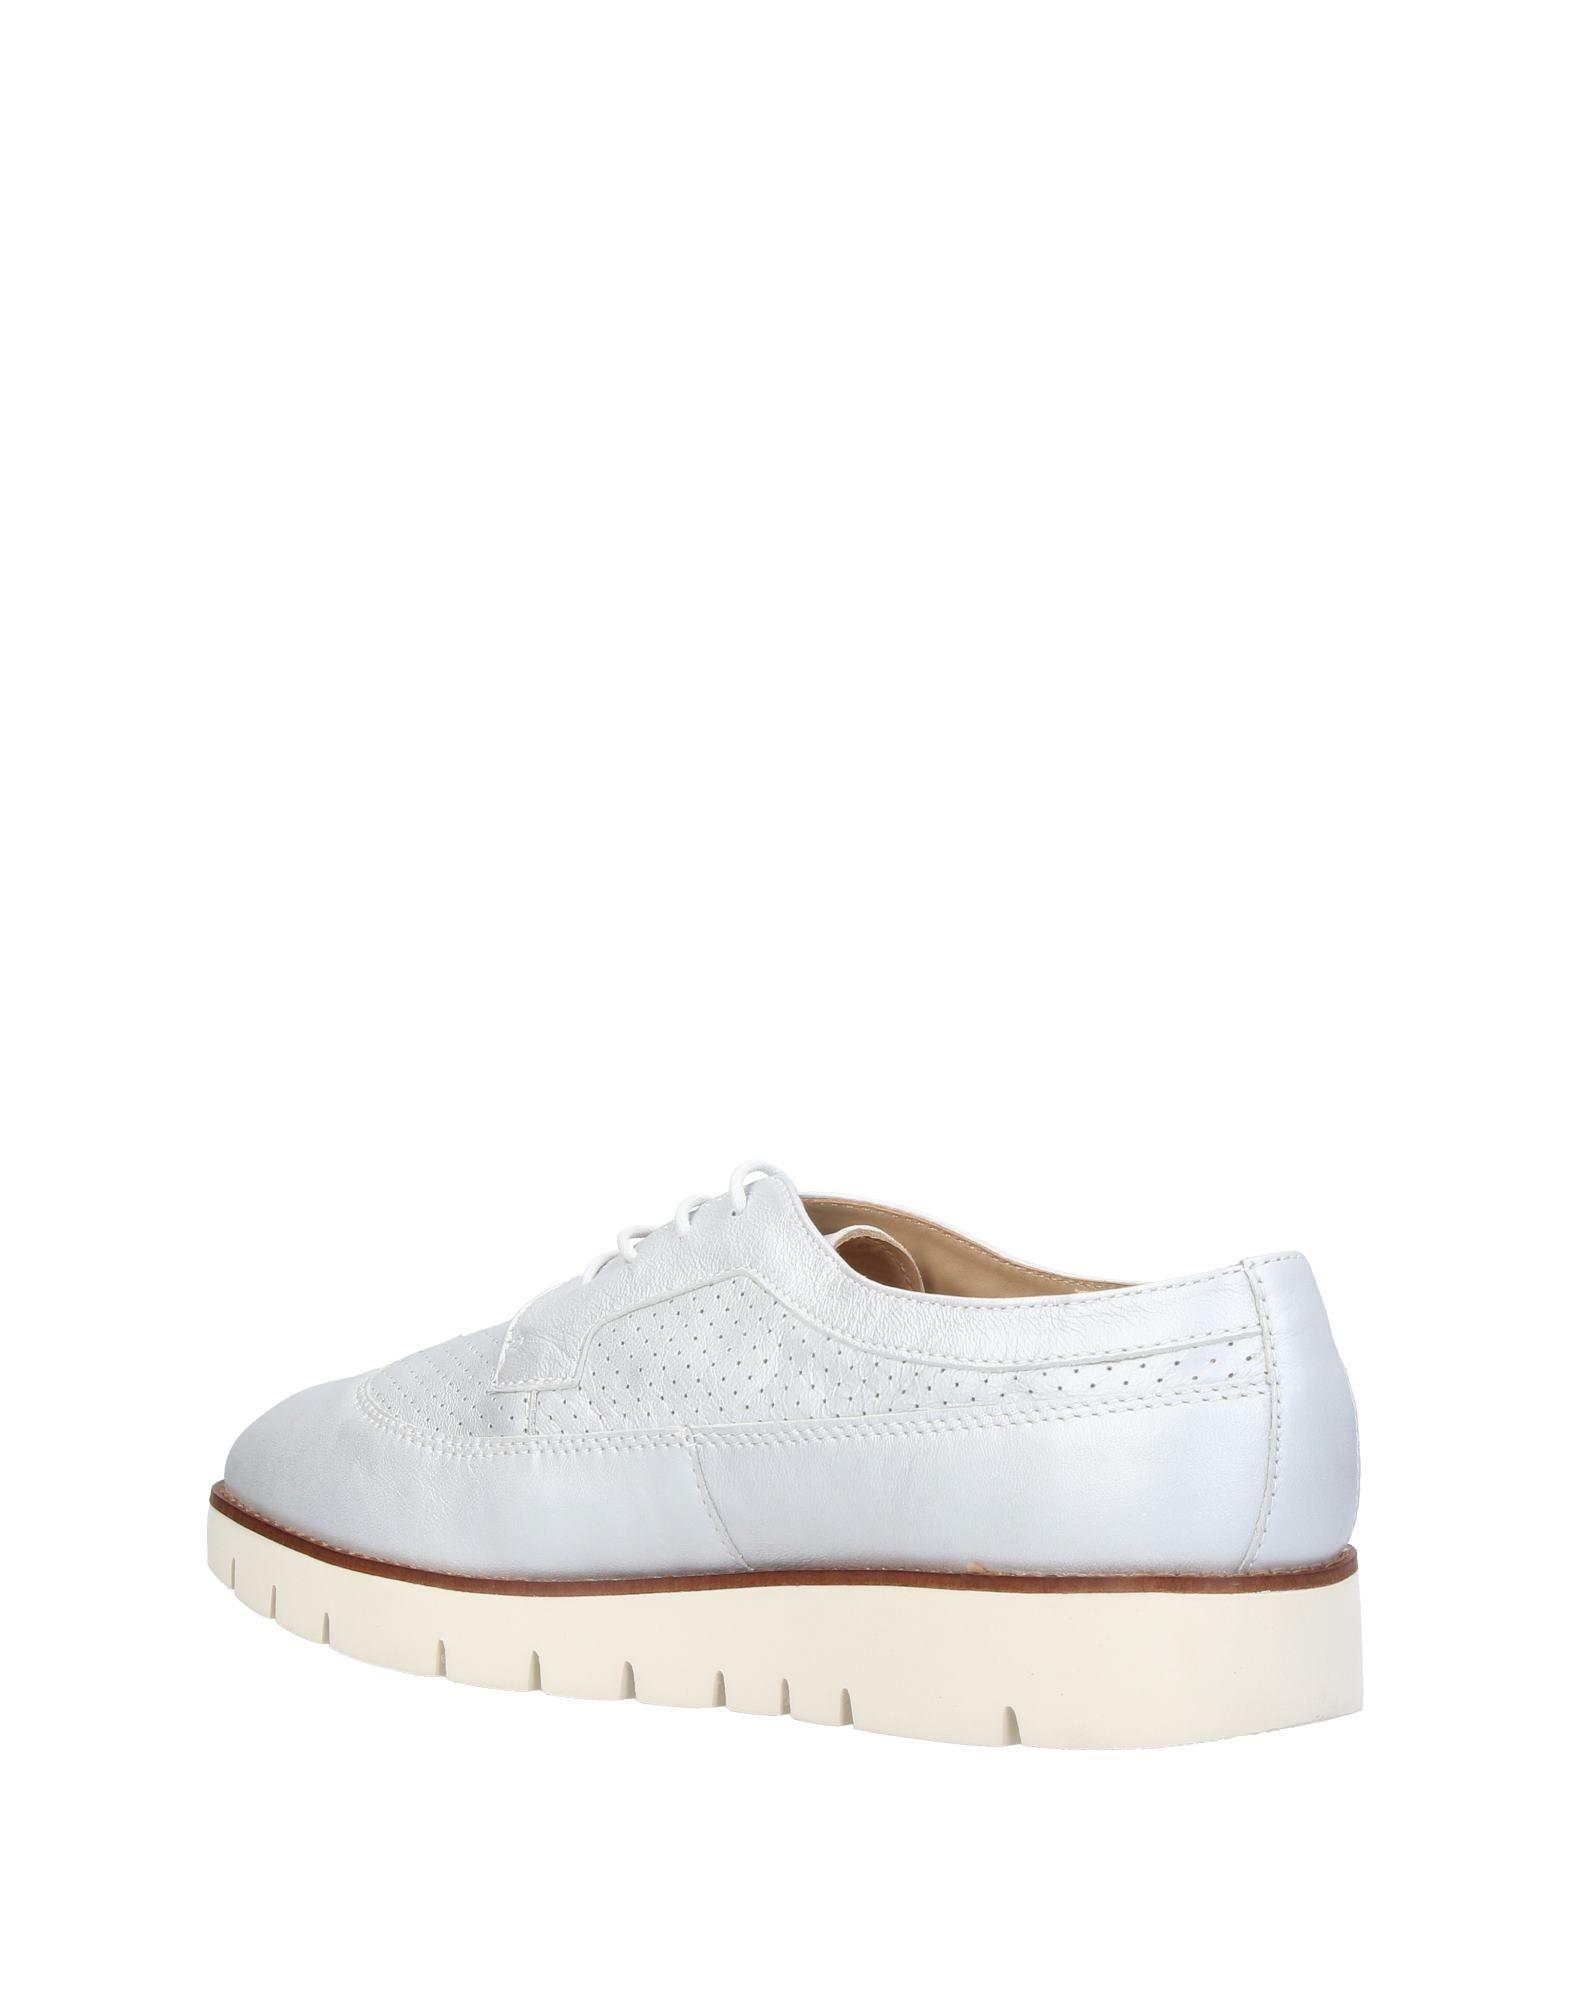 Chaussures Chaussures Chaussures Chaussures Chaussures Chaussures Chaussures Chaussures Chaussures Chaussures Chaussures Chaussures ZrqdrY